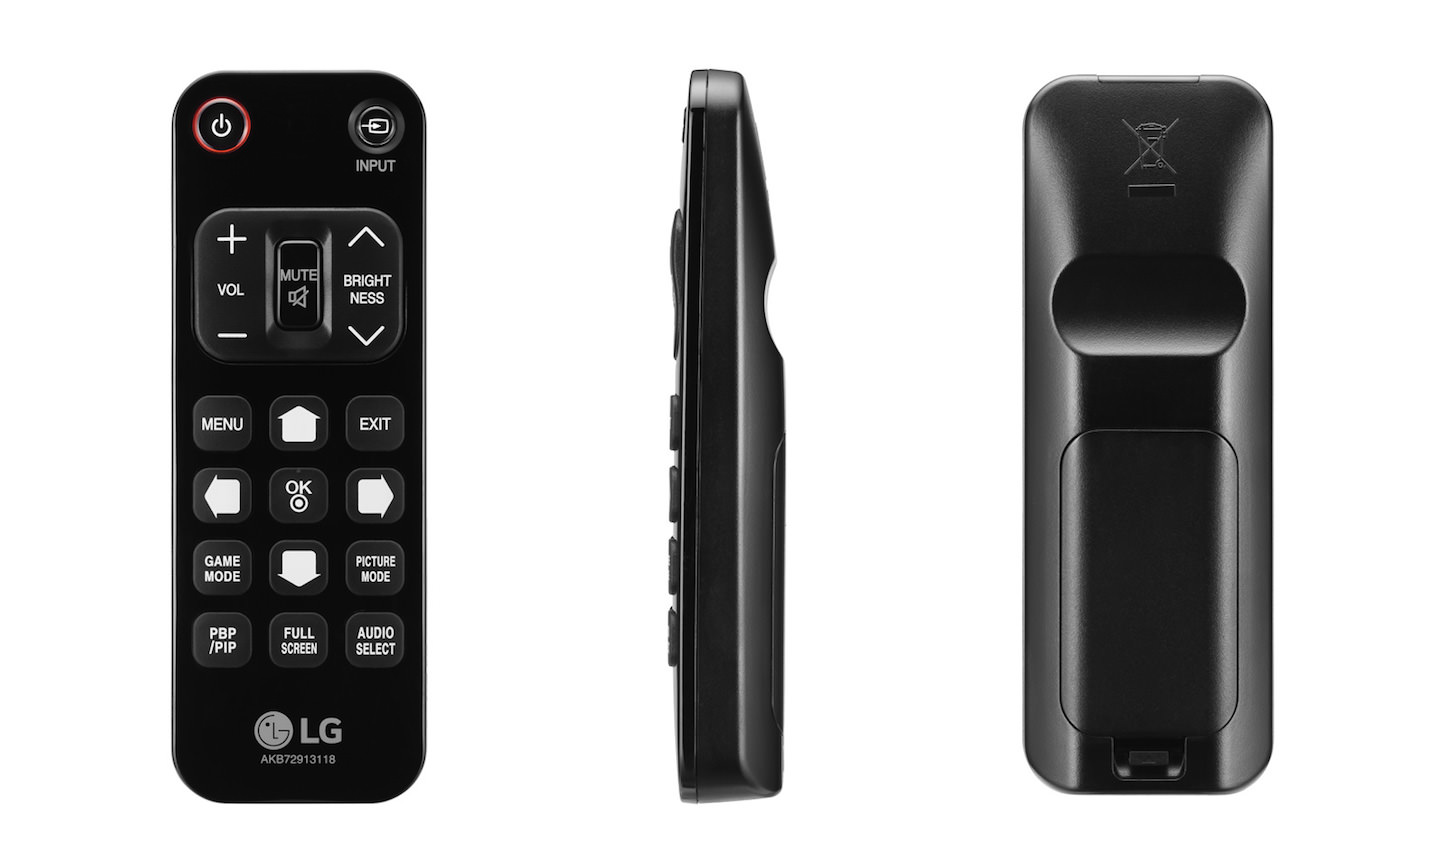 LG-43inch-Display-3.jpg